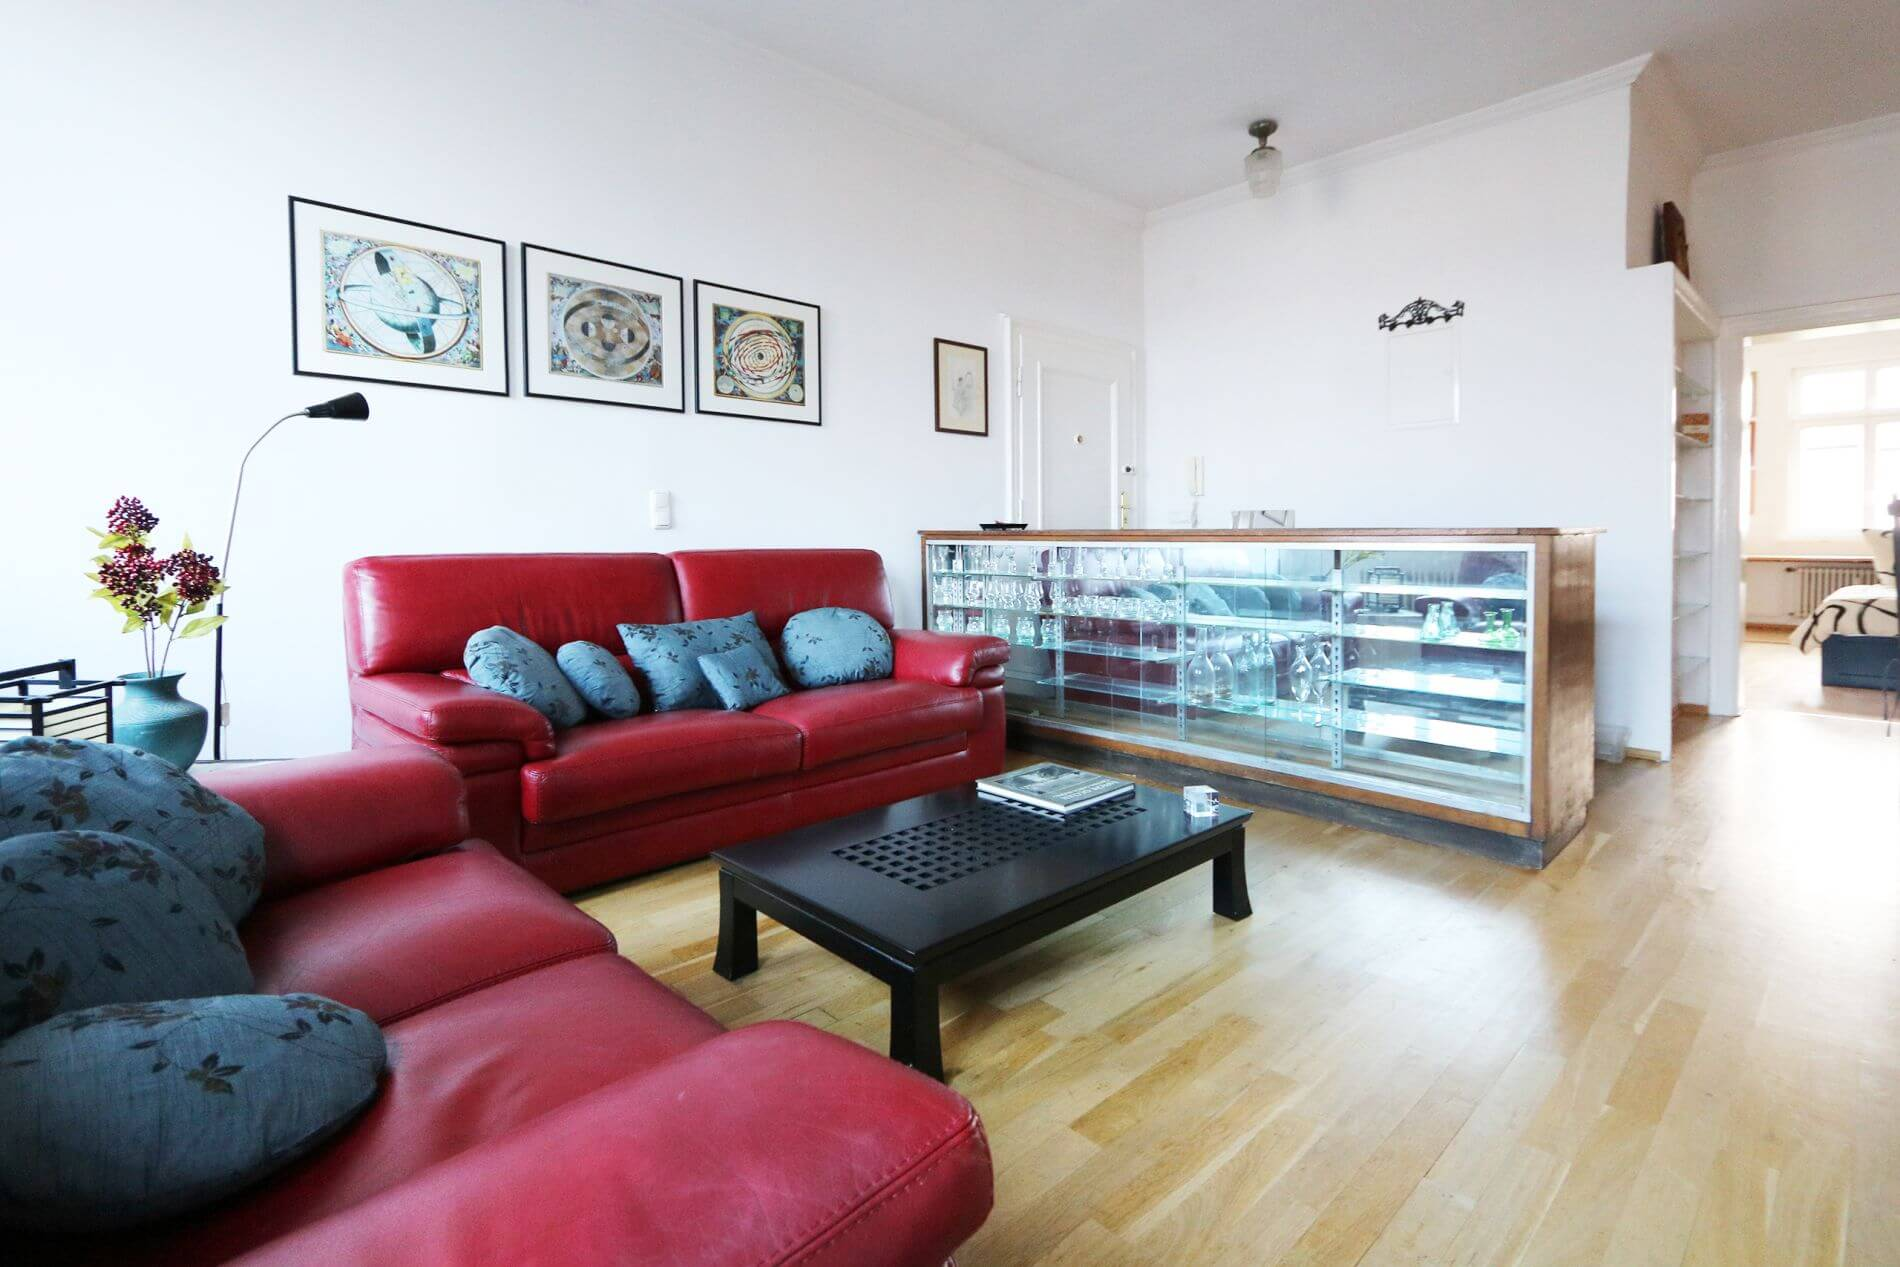 2 bedroom serviced apartment in Frankfurter Allee, Berlin ideal for short term stays